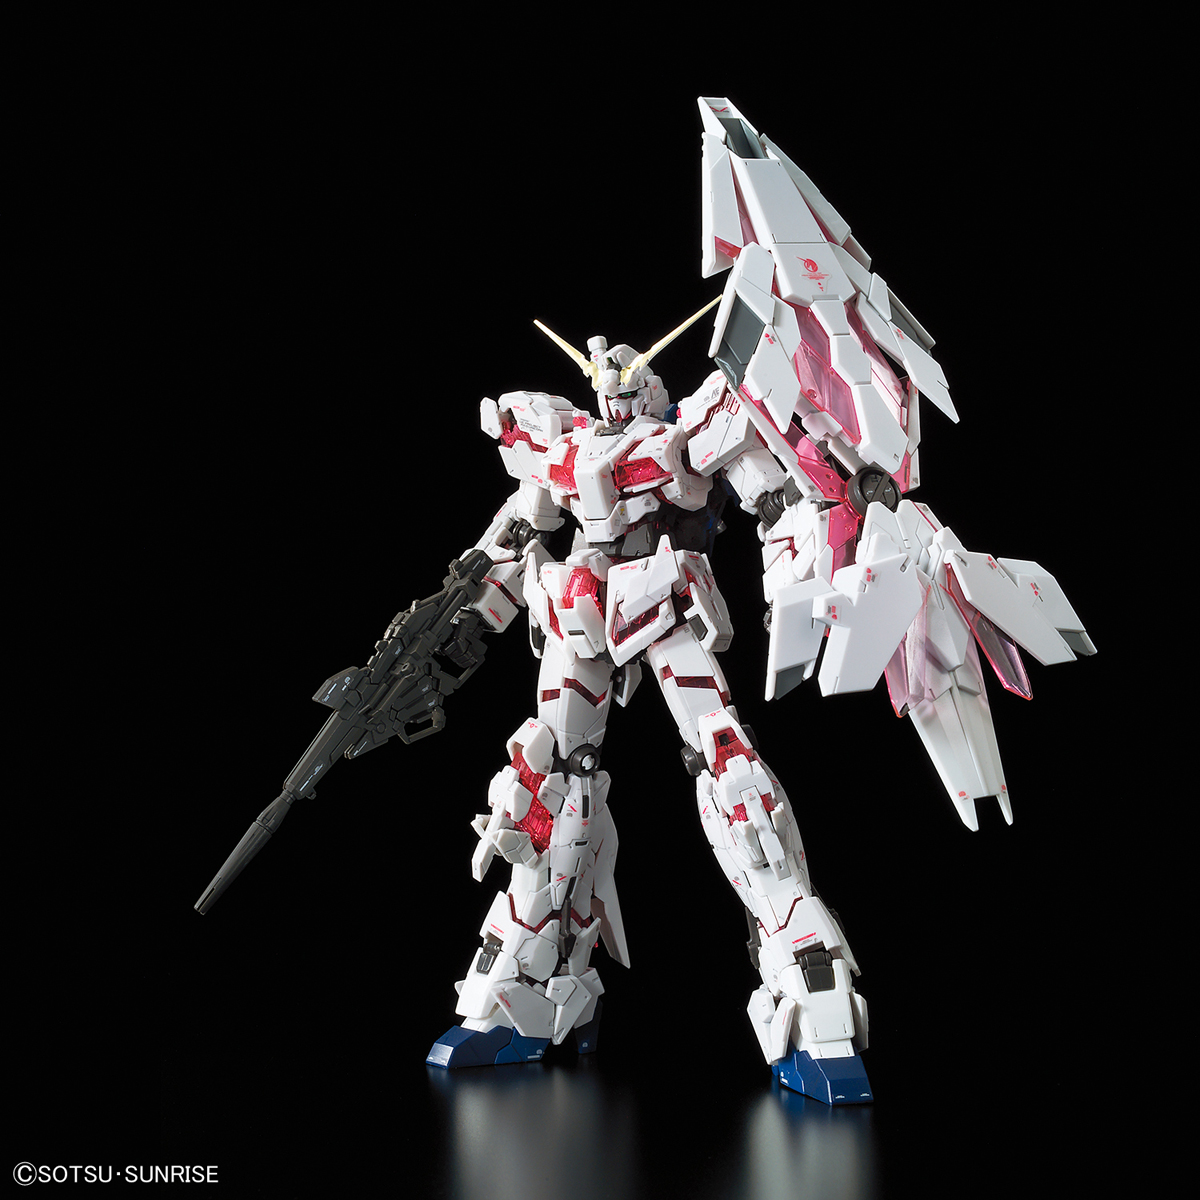 62268RG 1/144 RX-0 ユニコーンガンダム (バンデシネVer.) [Unicorn Gundam (Bande Dessinee Ver.)]